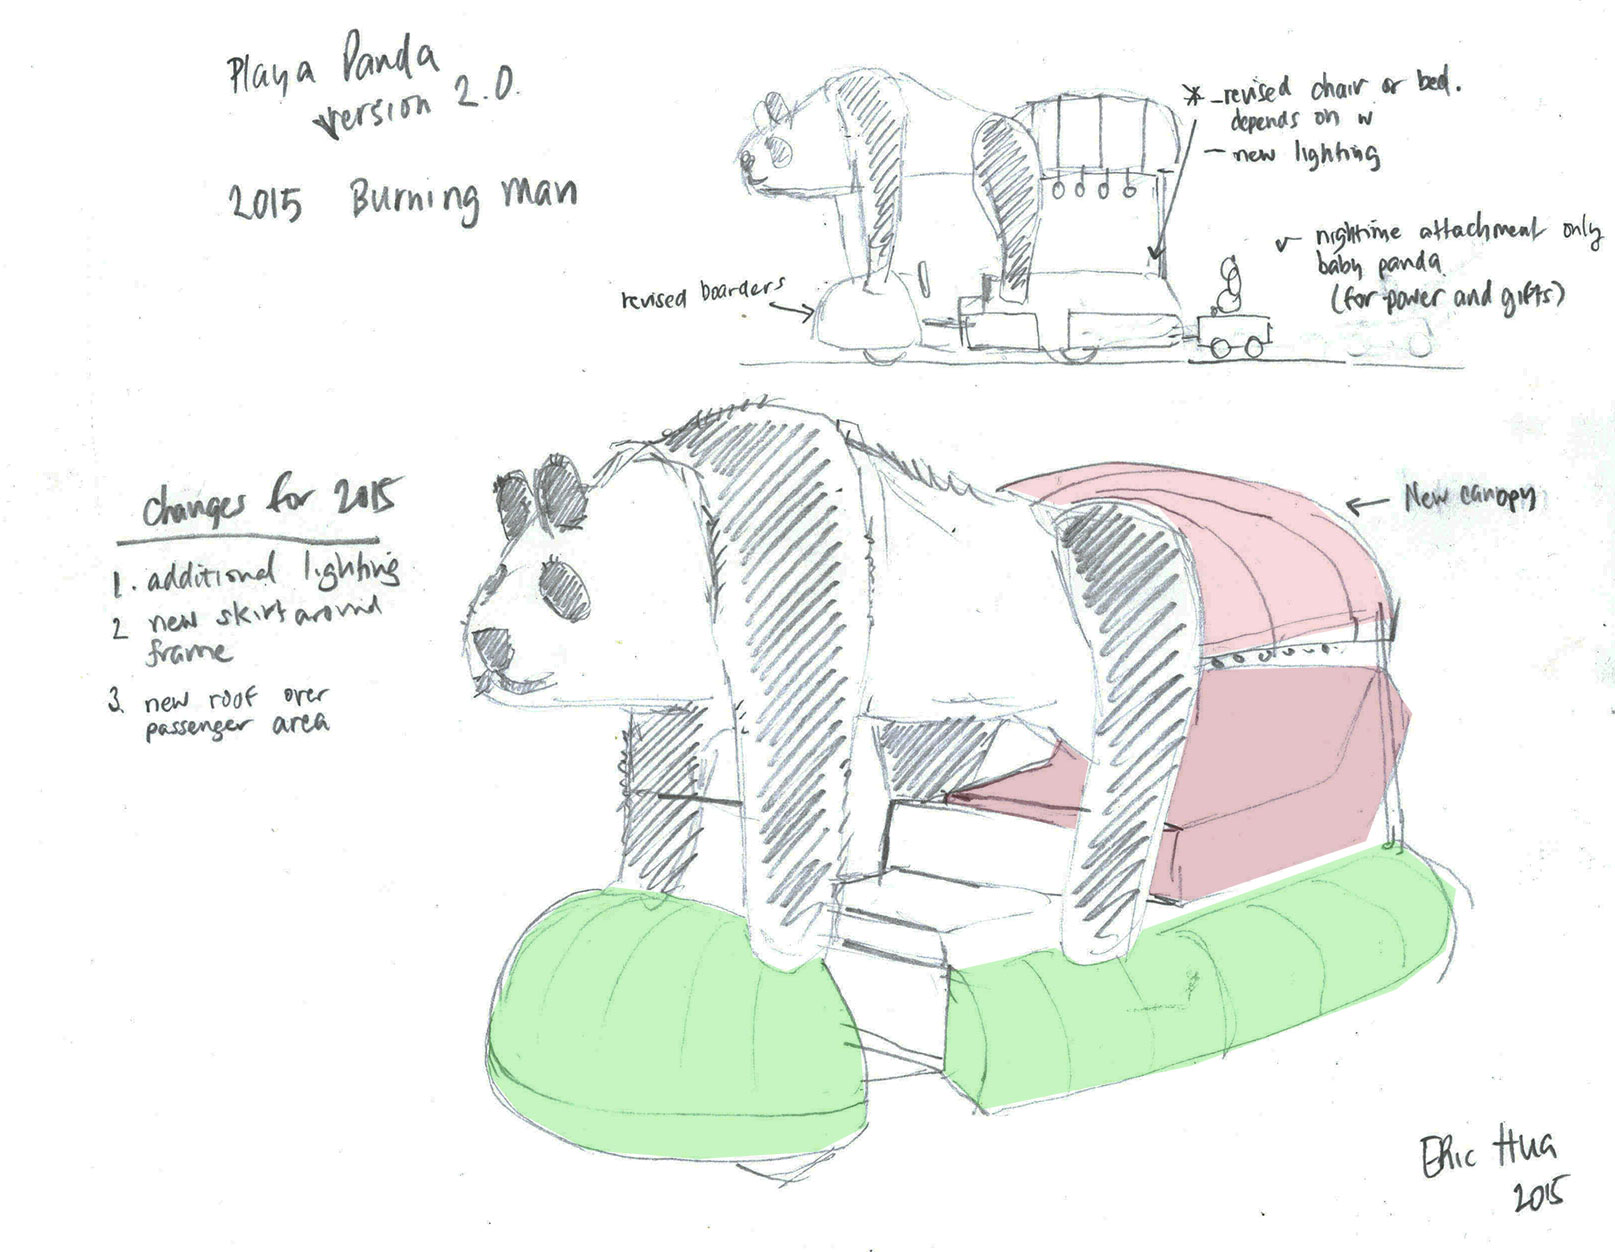 2015 Derpy Sketch